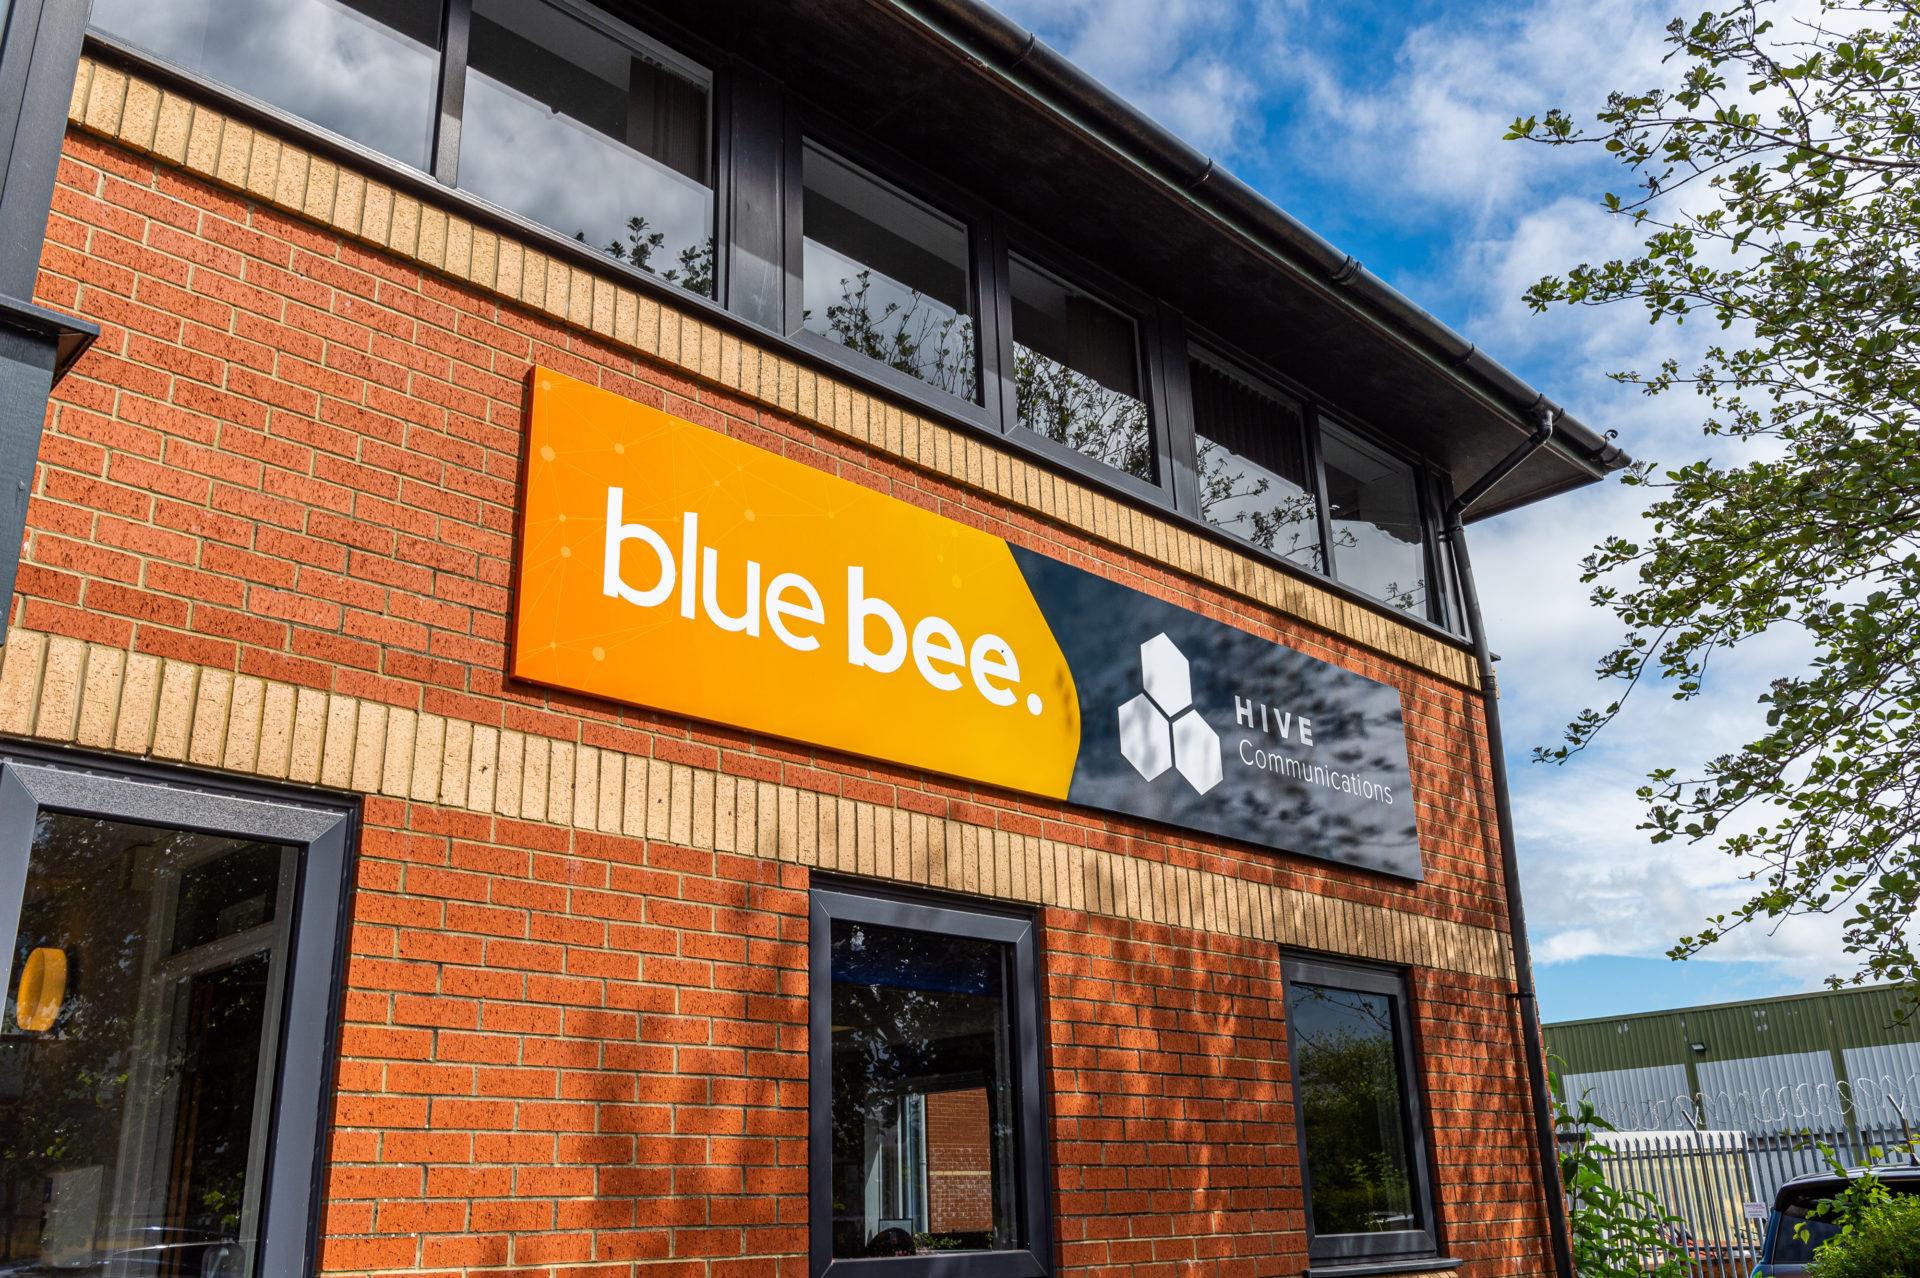 Blue bee blog